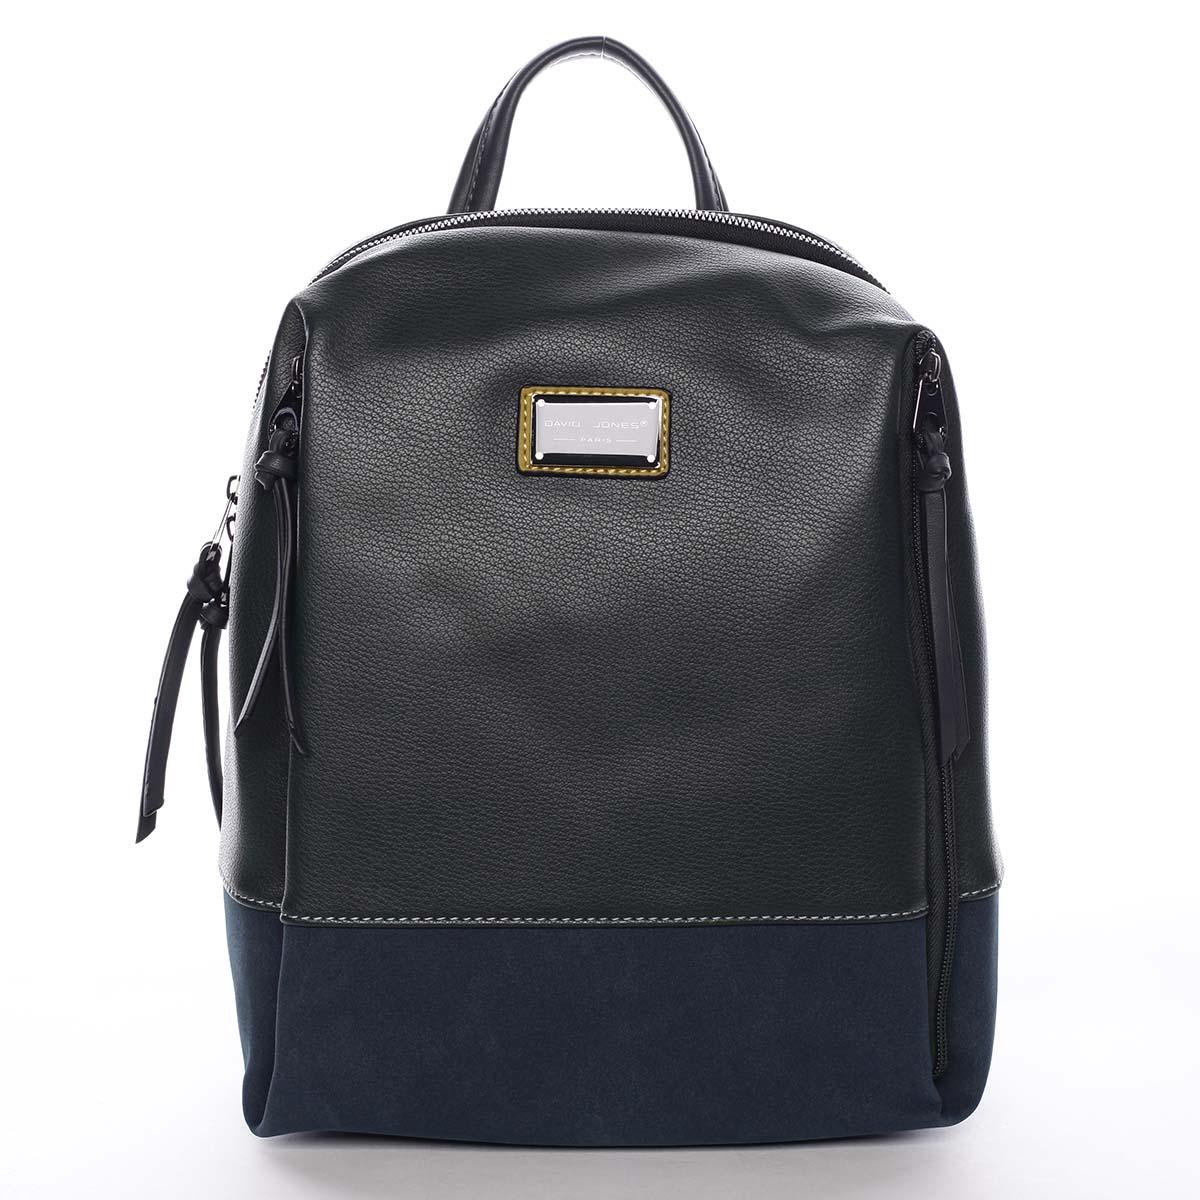 Dámsky batoh tmavozelený - David Jones Nova